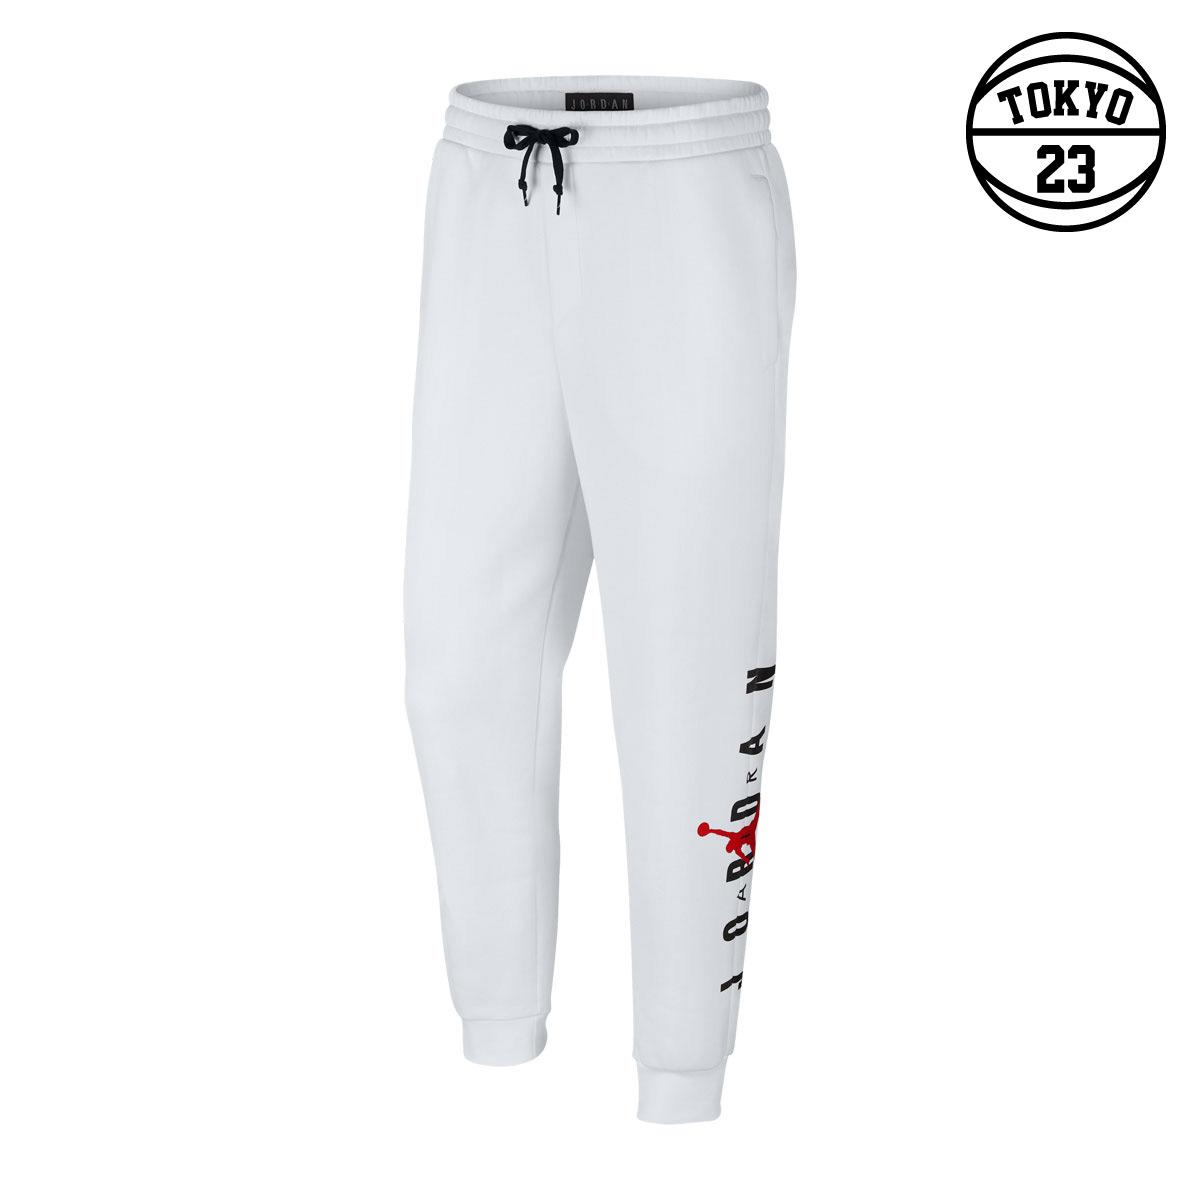 65b16e1d9dc24e Kinetics  NIKE JUMPMAN AIR GFX FLEECE PANT (WHITE GYM RED) (Nike Jordan  jump man air GFX fleece underwear)